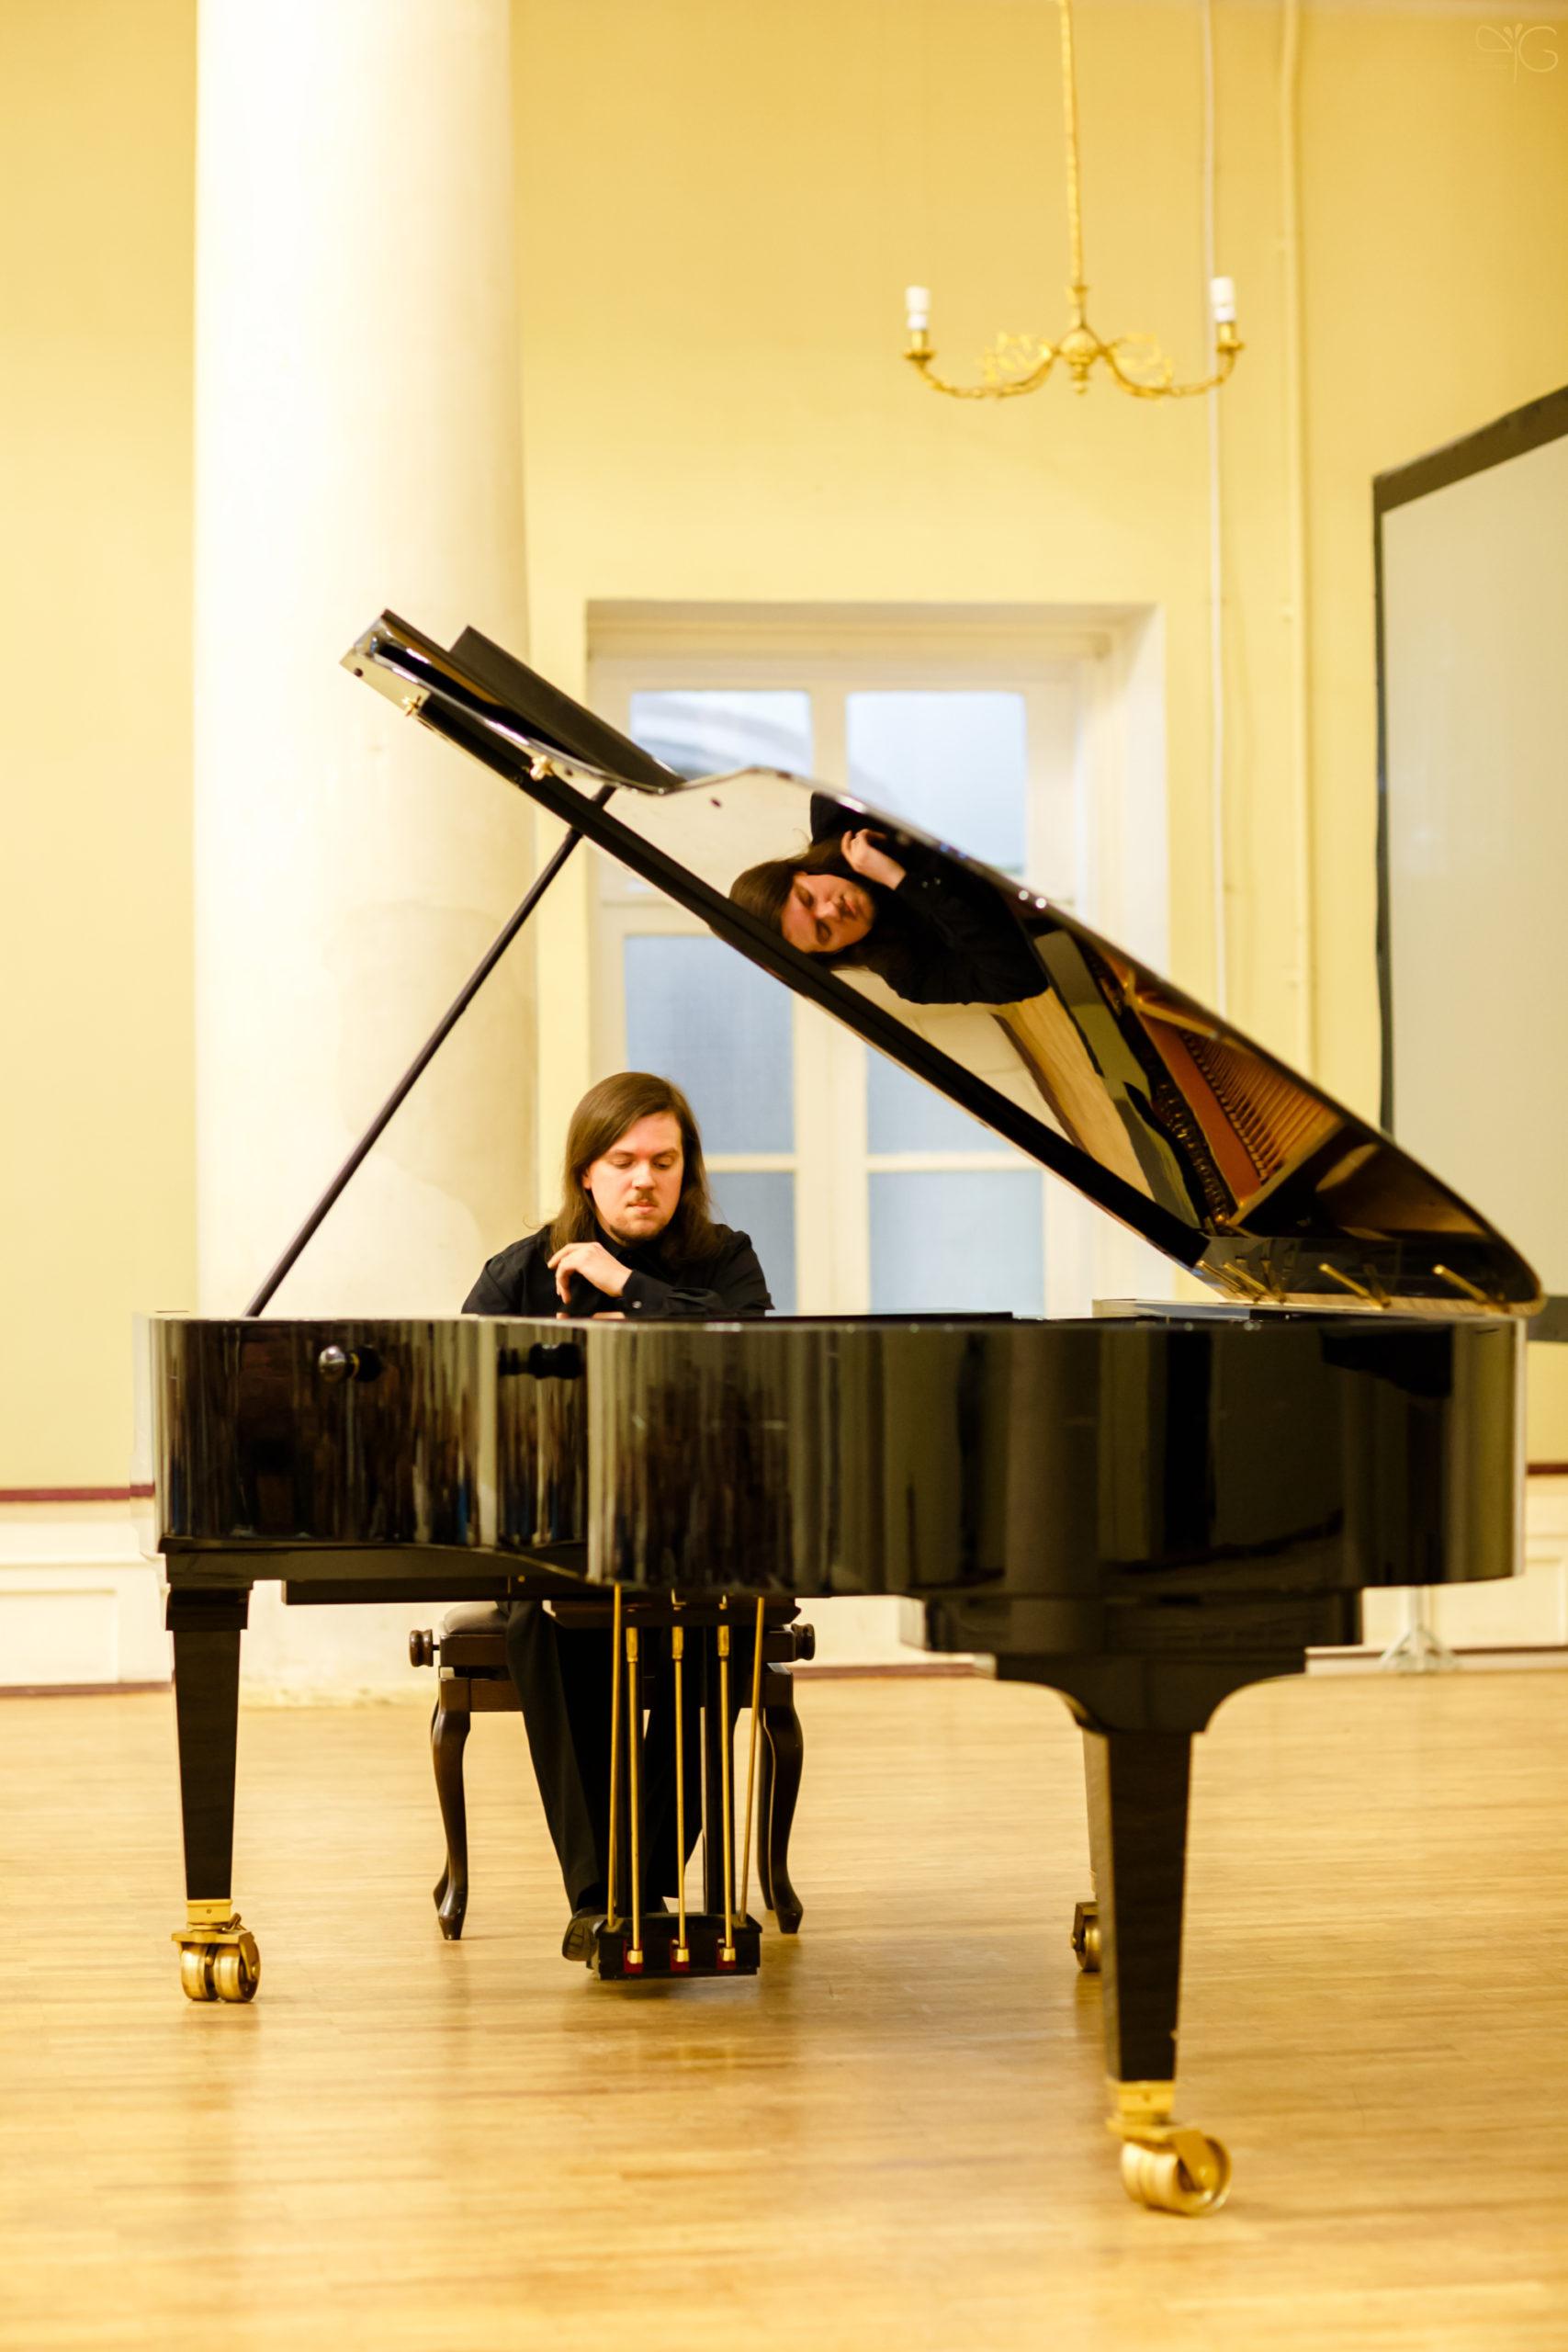 Концерт Александра Чаплинского в СПбГУ 19 февраля 2015